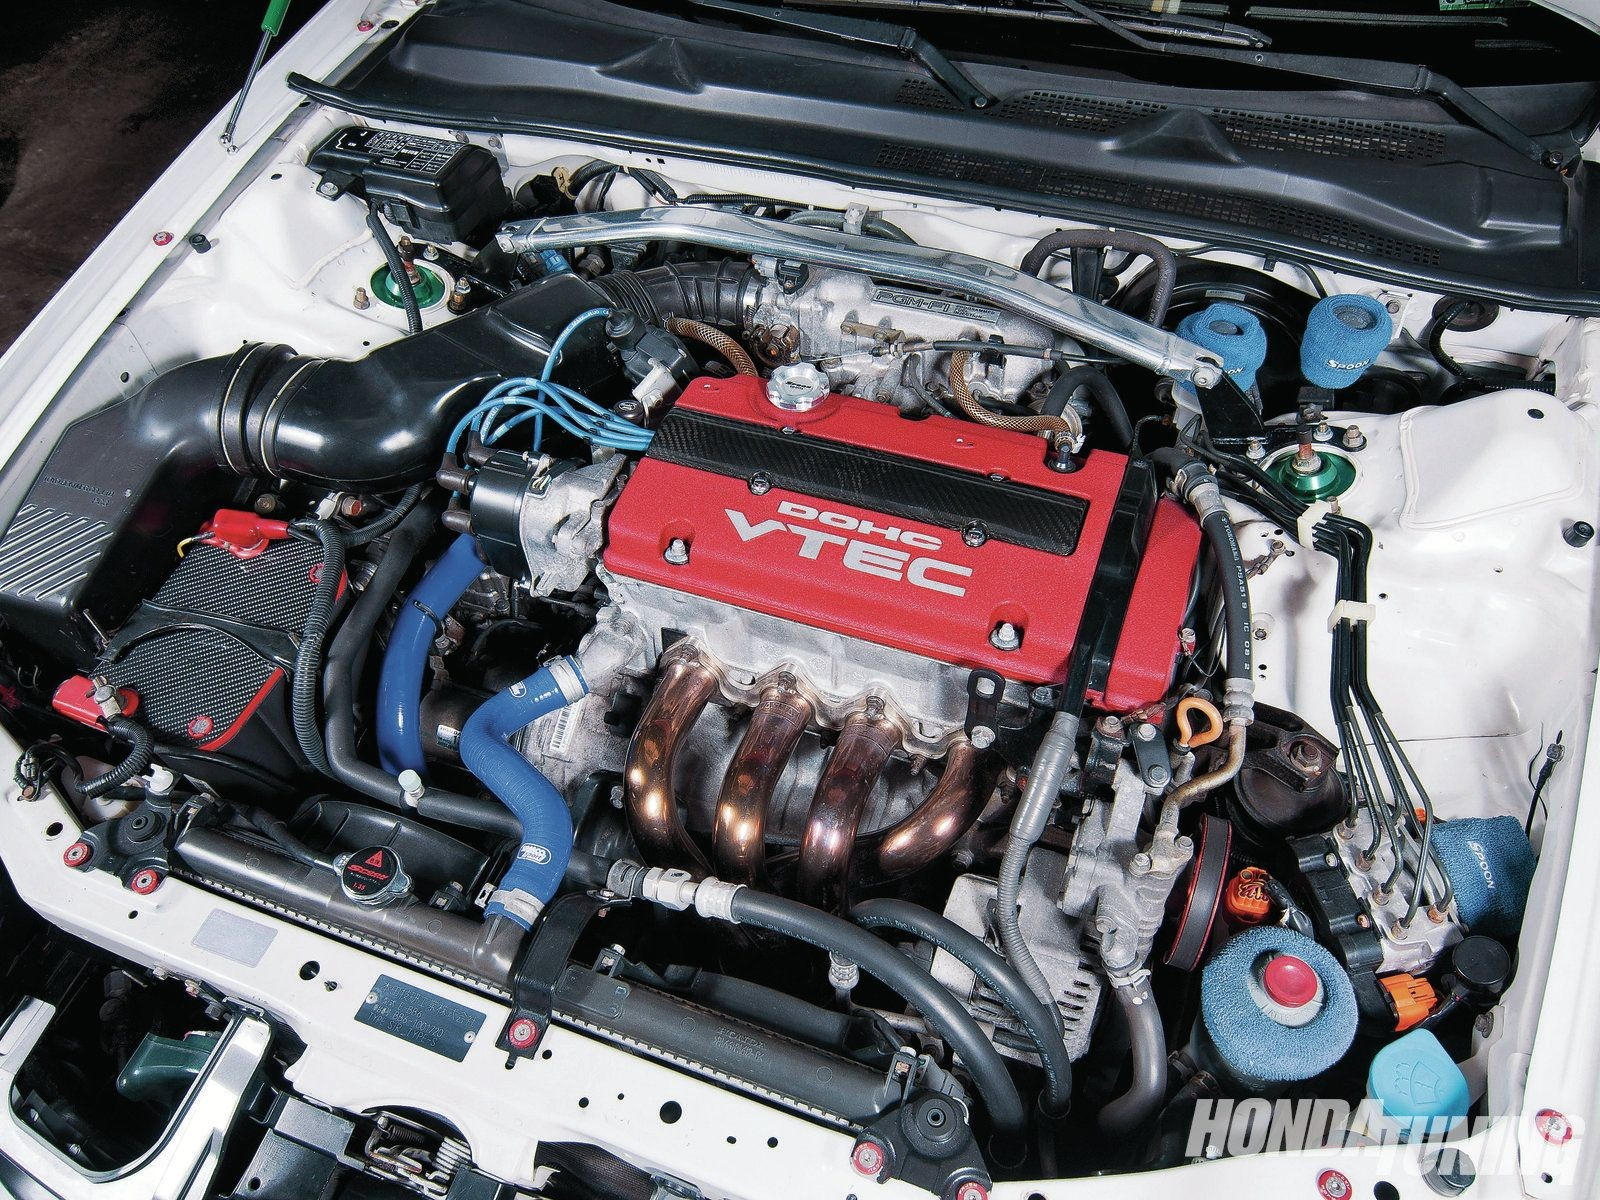 1999 Honda Prelude Engine Diagram 1999 Honda Prelude S Informations  Articles Bestcarmag Of 1999 Honda Prelude